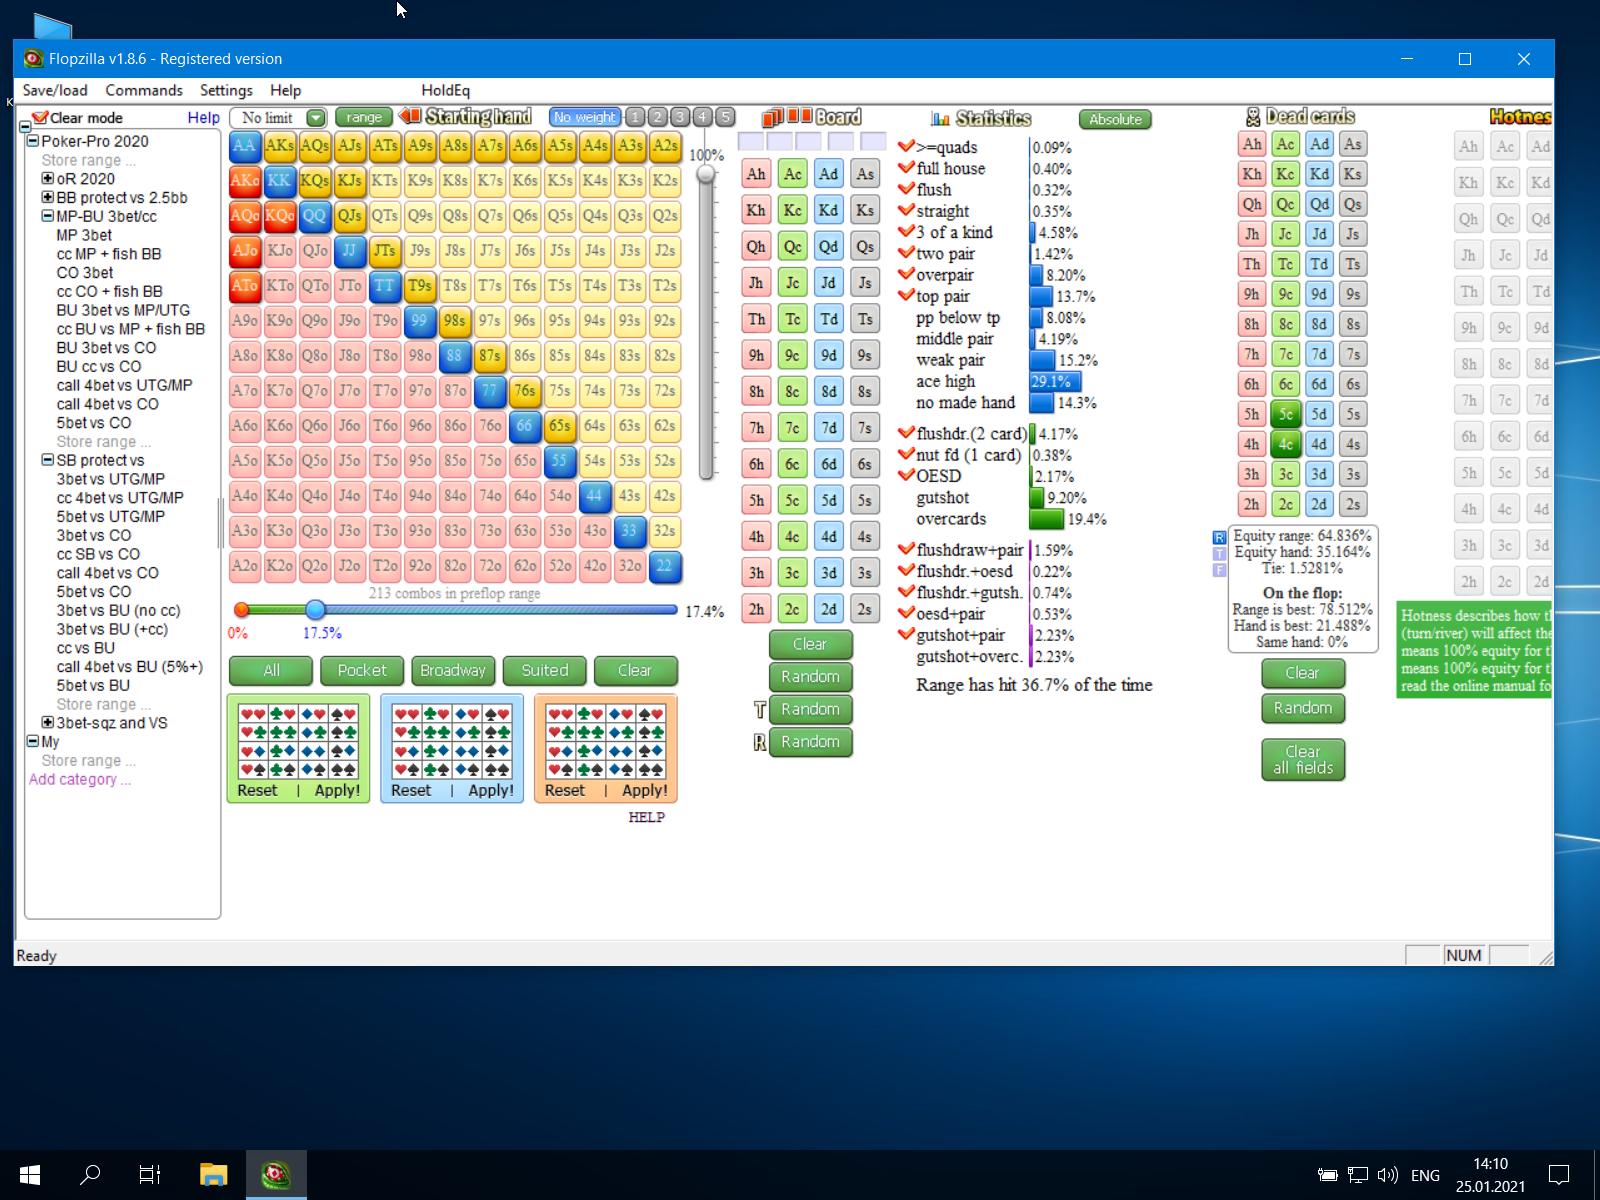 virtualboxwin-10250120211410321611573694.png